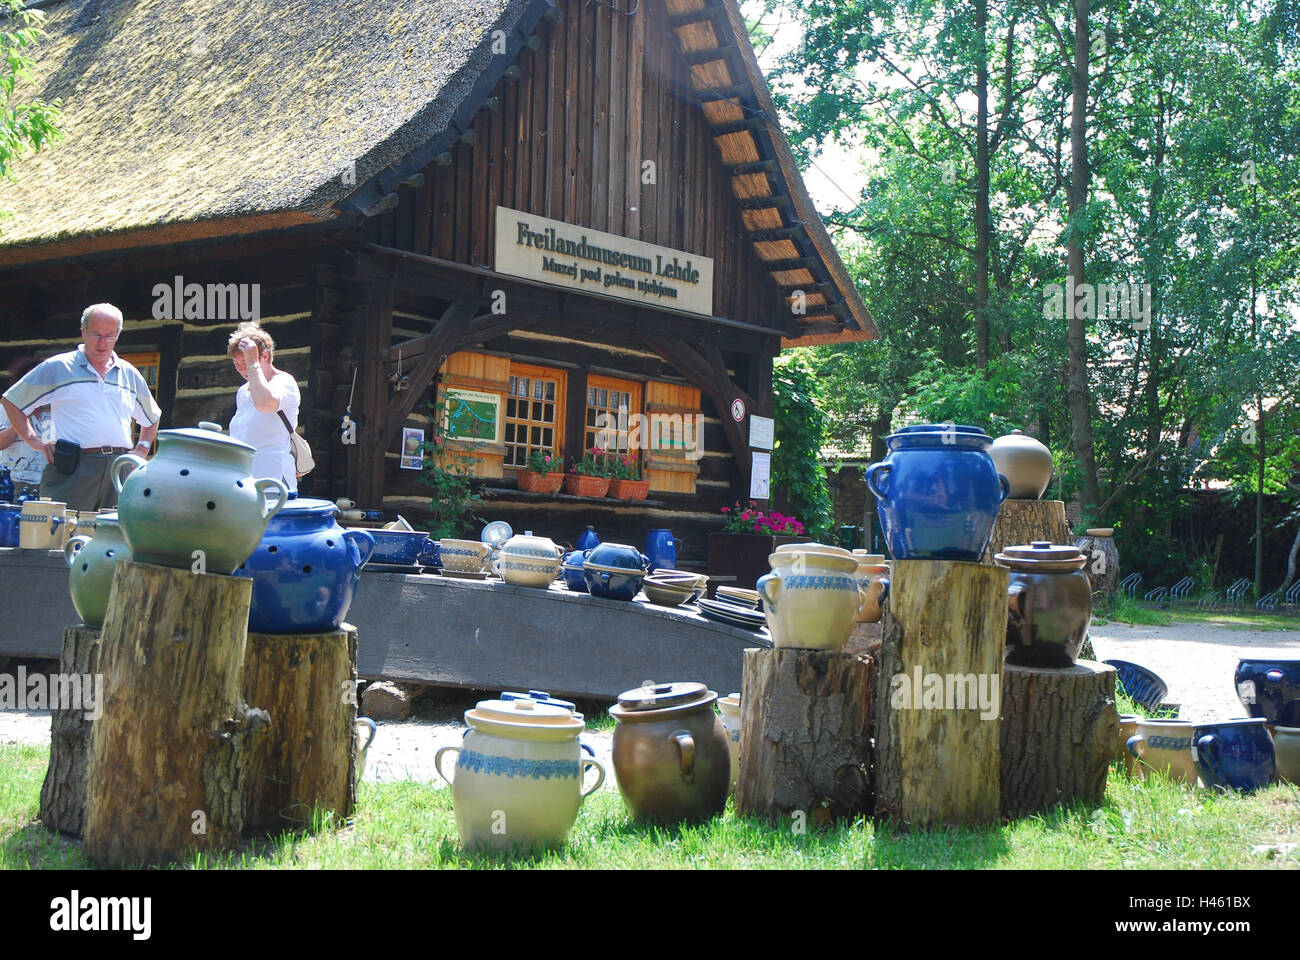 Germany, Brandenburg, Lusatia, Lübbenau, Lehde, Spreewald, open land museum, pottery, visitor, no model release, - Stock Image